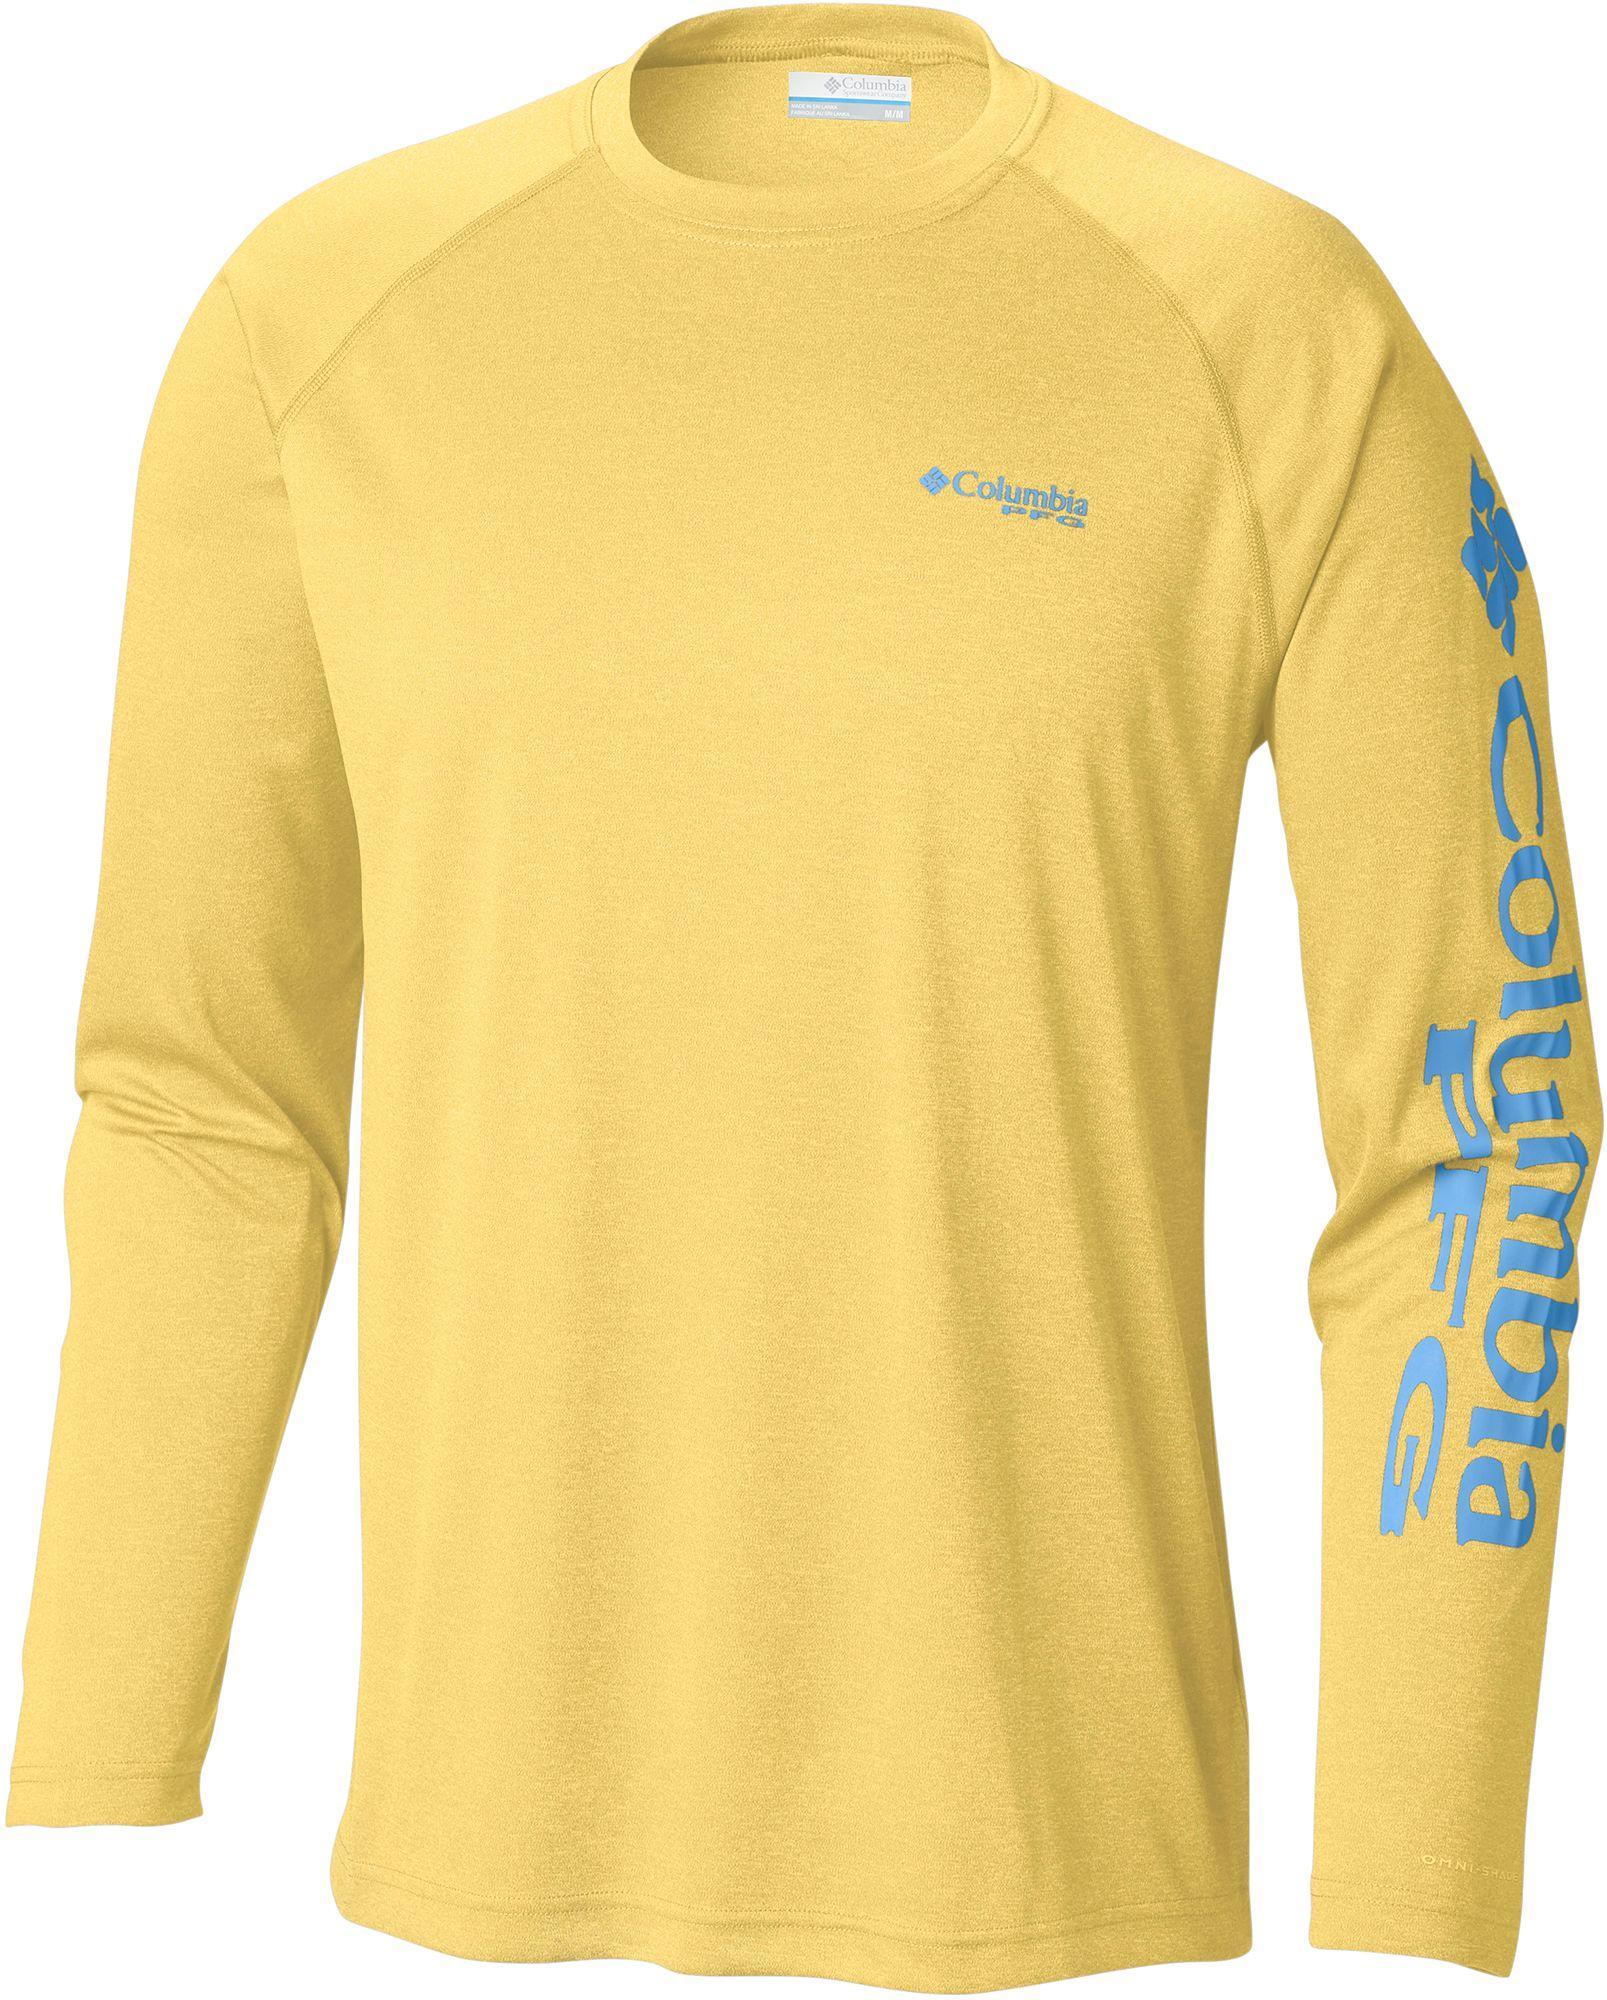 42e907fe39d Columbia - Yellow Pfg Terminal Tackle Heather Long Sleeve Shirt for Men -  Lyst. View fullscreen